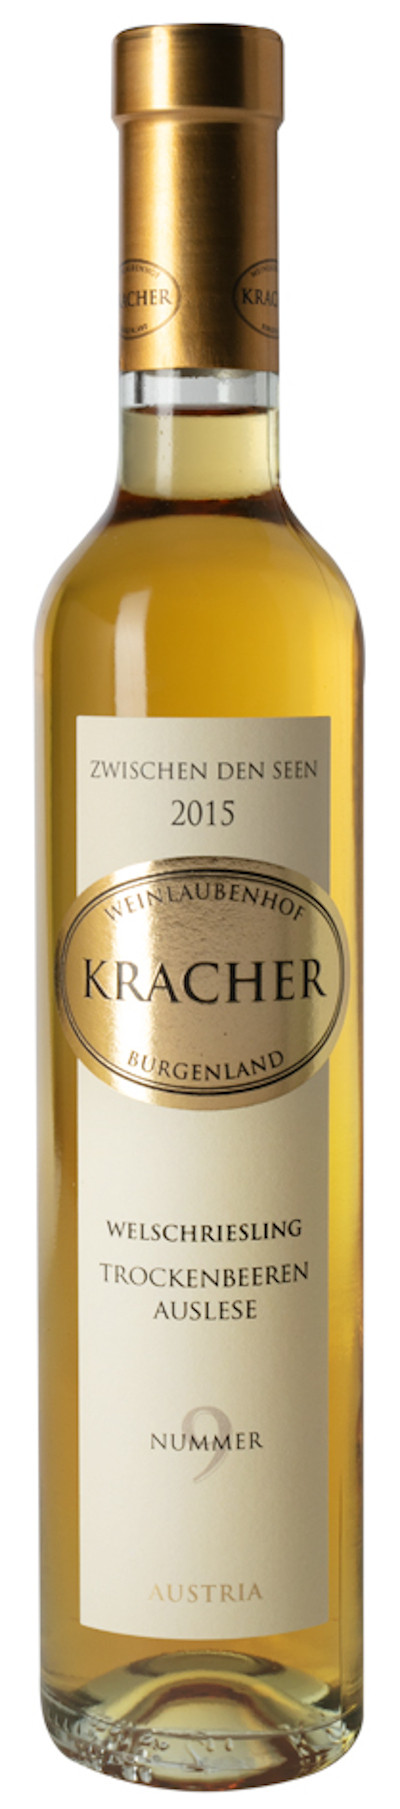 Kracher - Welschriesling Trockenbeerenauslese Nr. 9 Zwischen den Seen